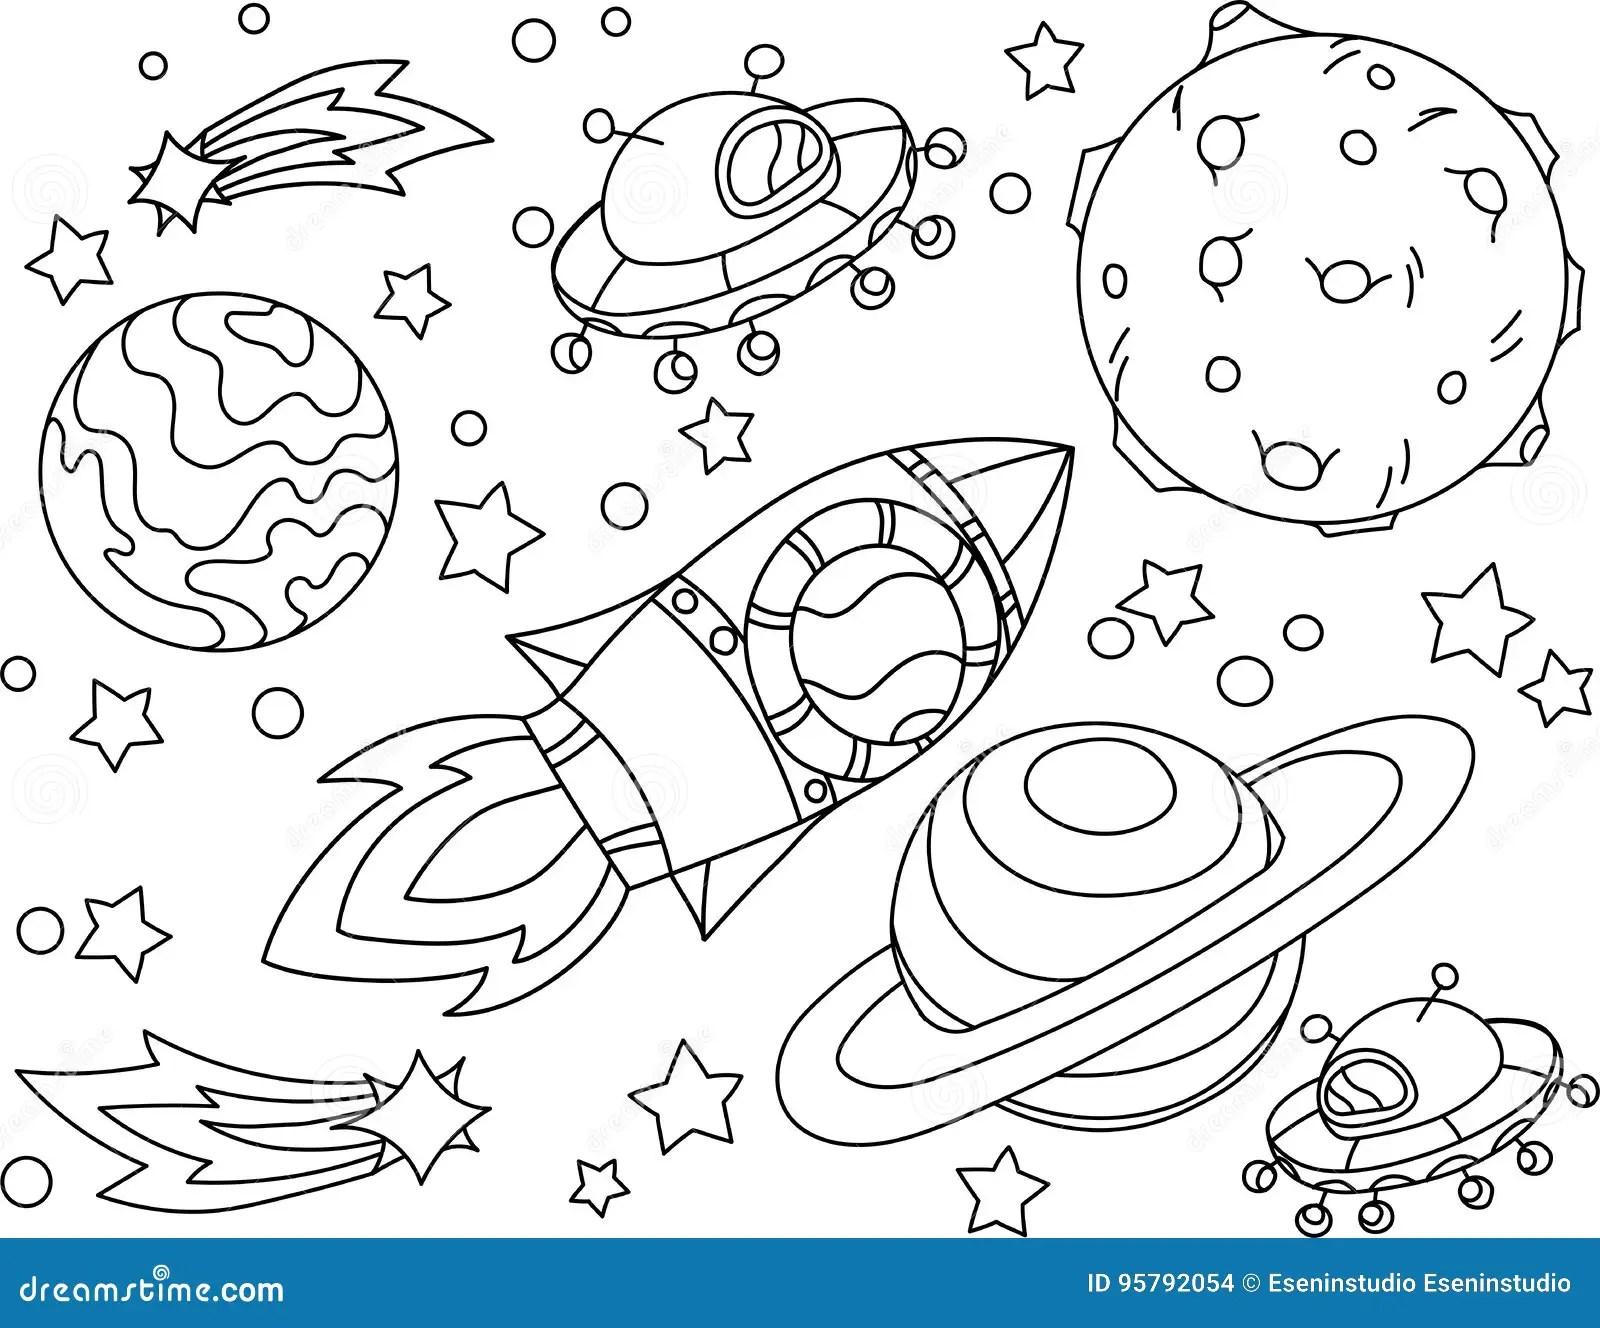 Rakete Fliegt Zum Mondmalbuch Antistress Planet Erde